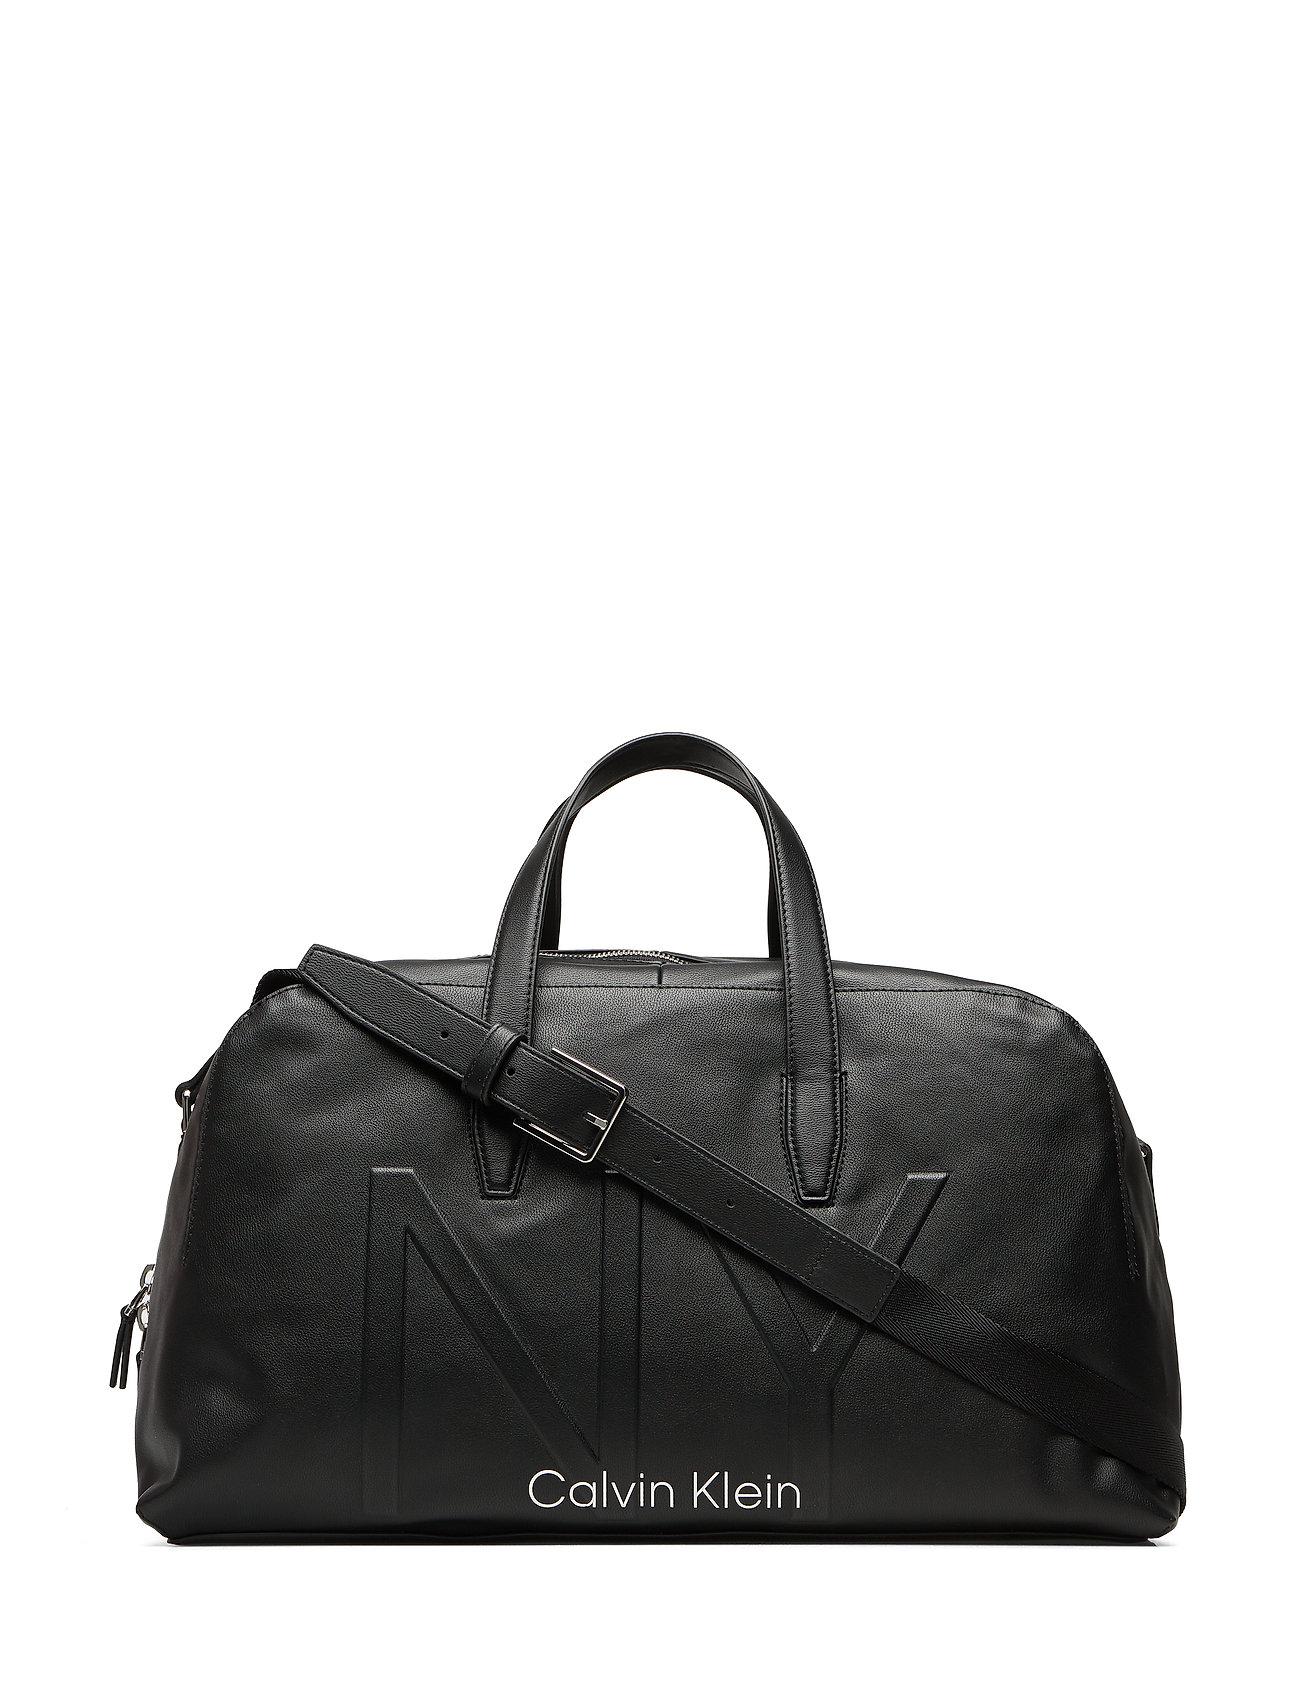 Calvin Klein NY SHAPED LARGE DUFFLE - BLACK